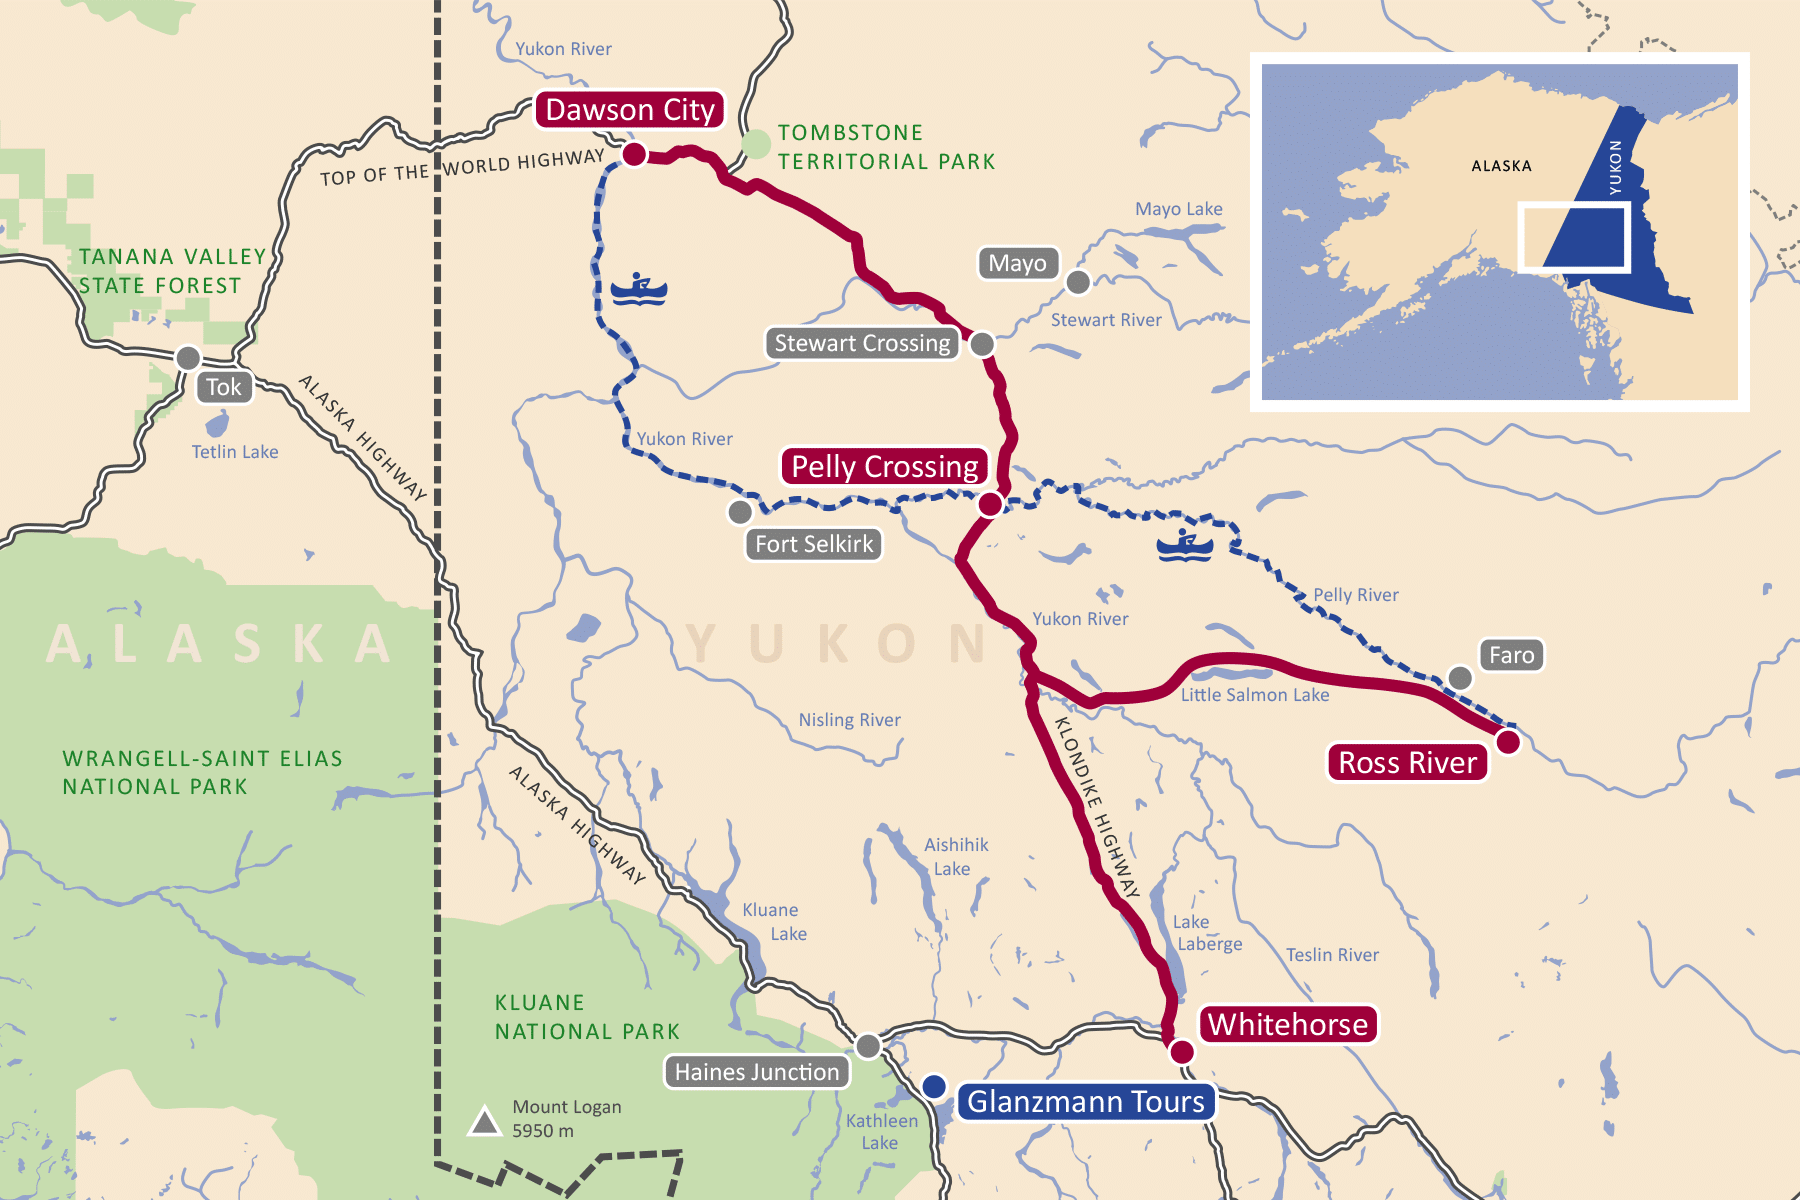 Karte der Pelly River Kanutour im Yukon